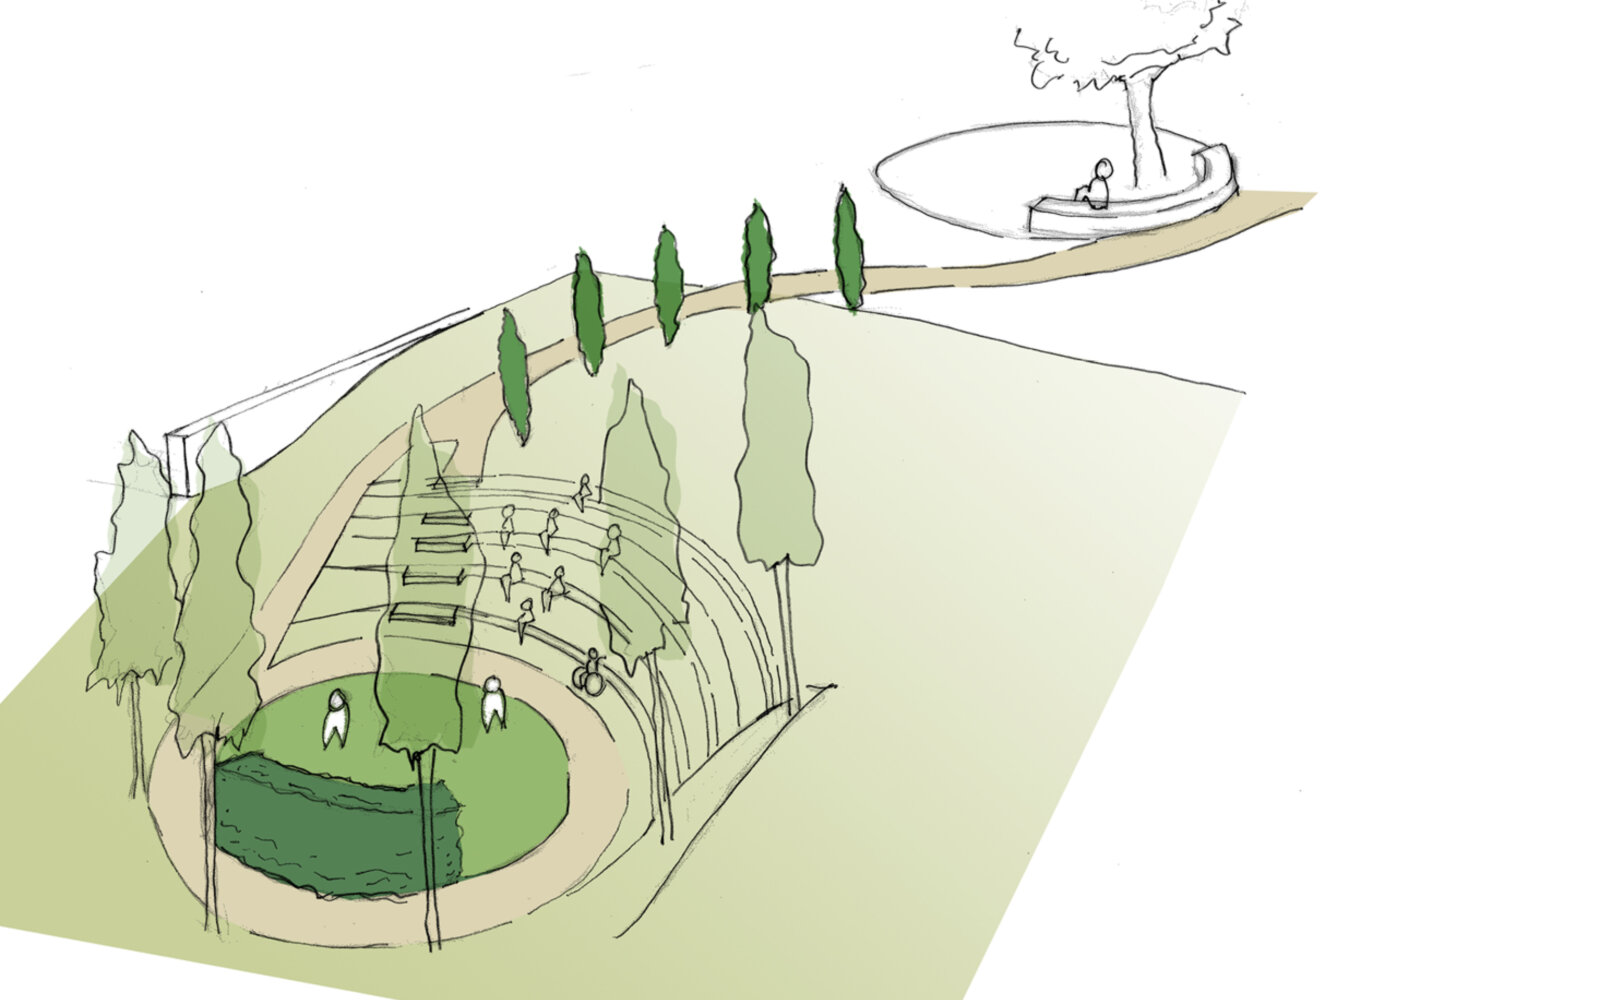 The Ruddock Performing Arts Centre landscape sketch